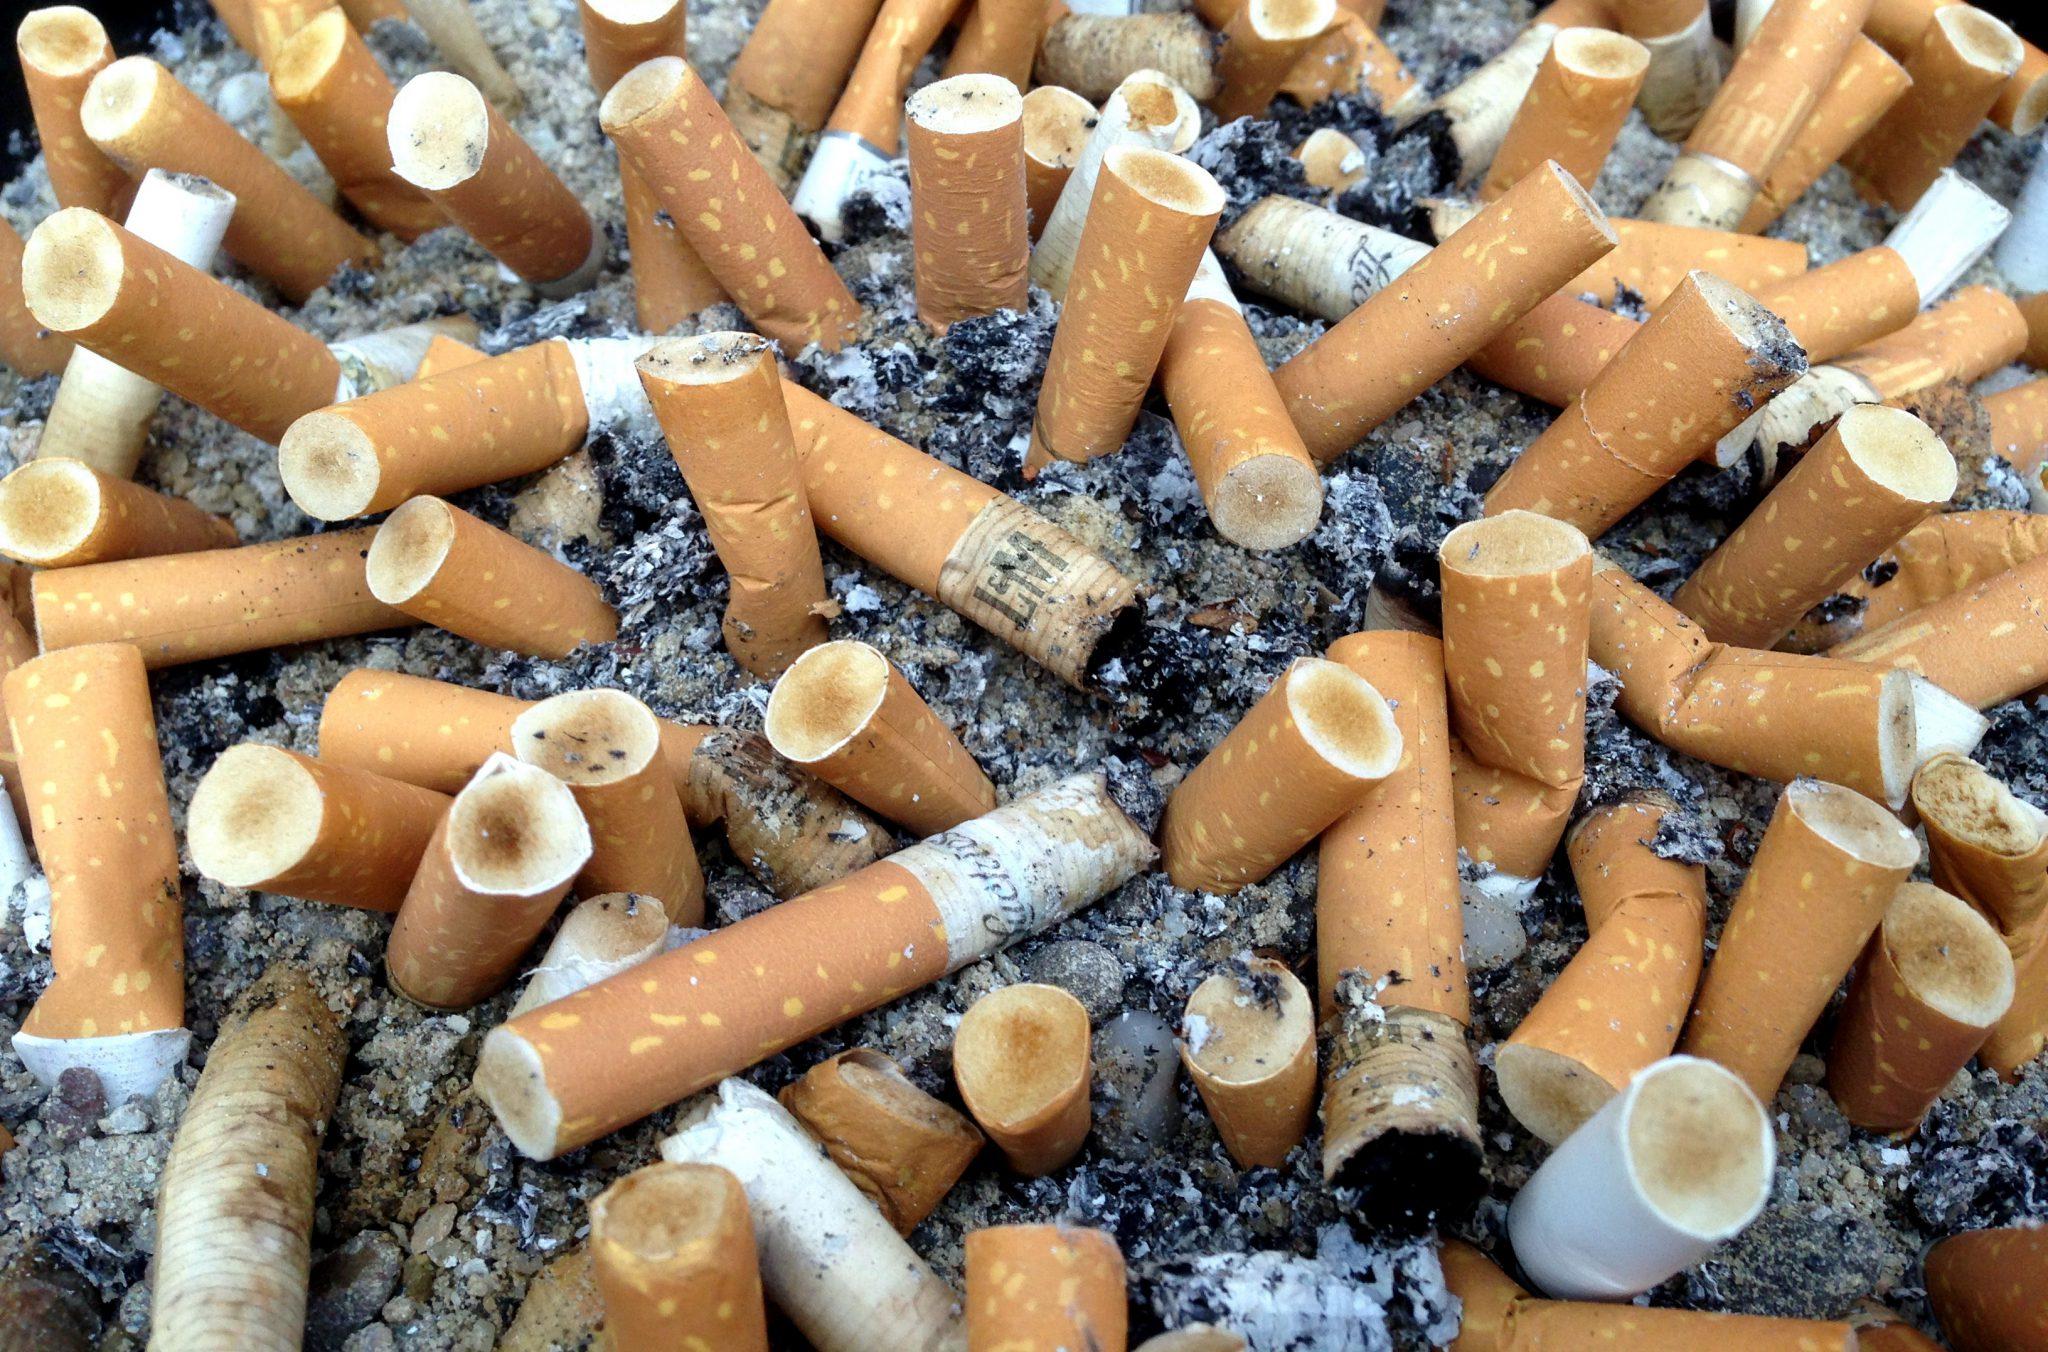 Mégots; cigarettes